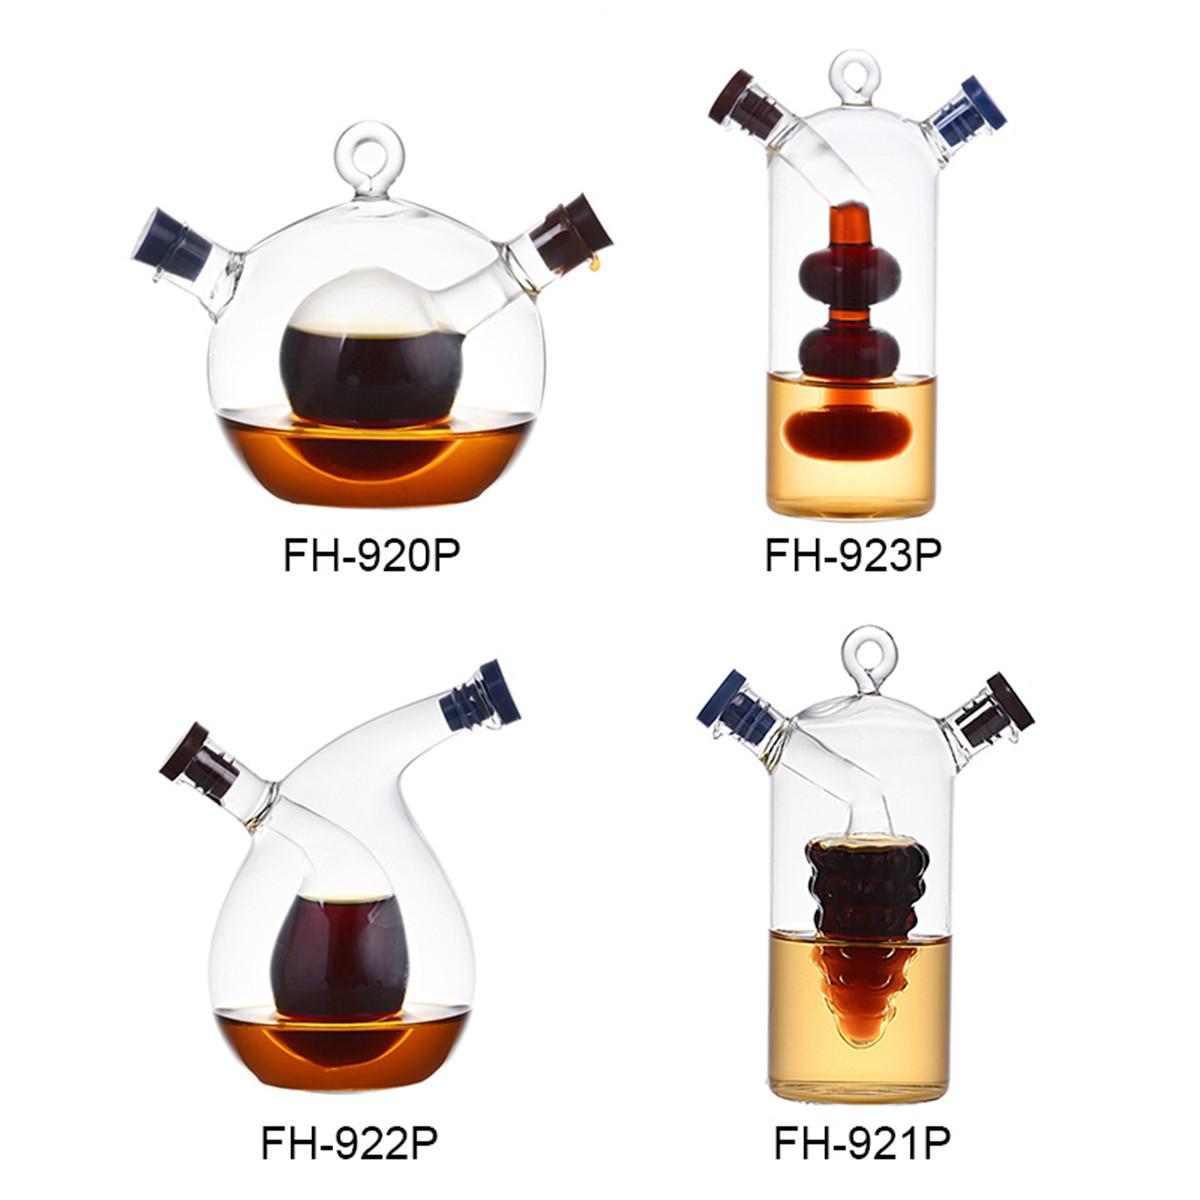 Kitchen 2 in 1 Glass Oil Vinegar Bottle Cruet Soy Sauce Holder Dispenser Storage